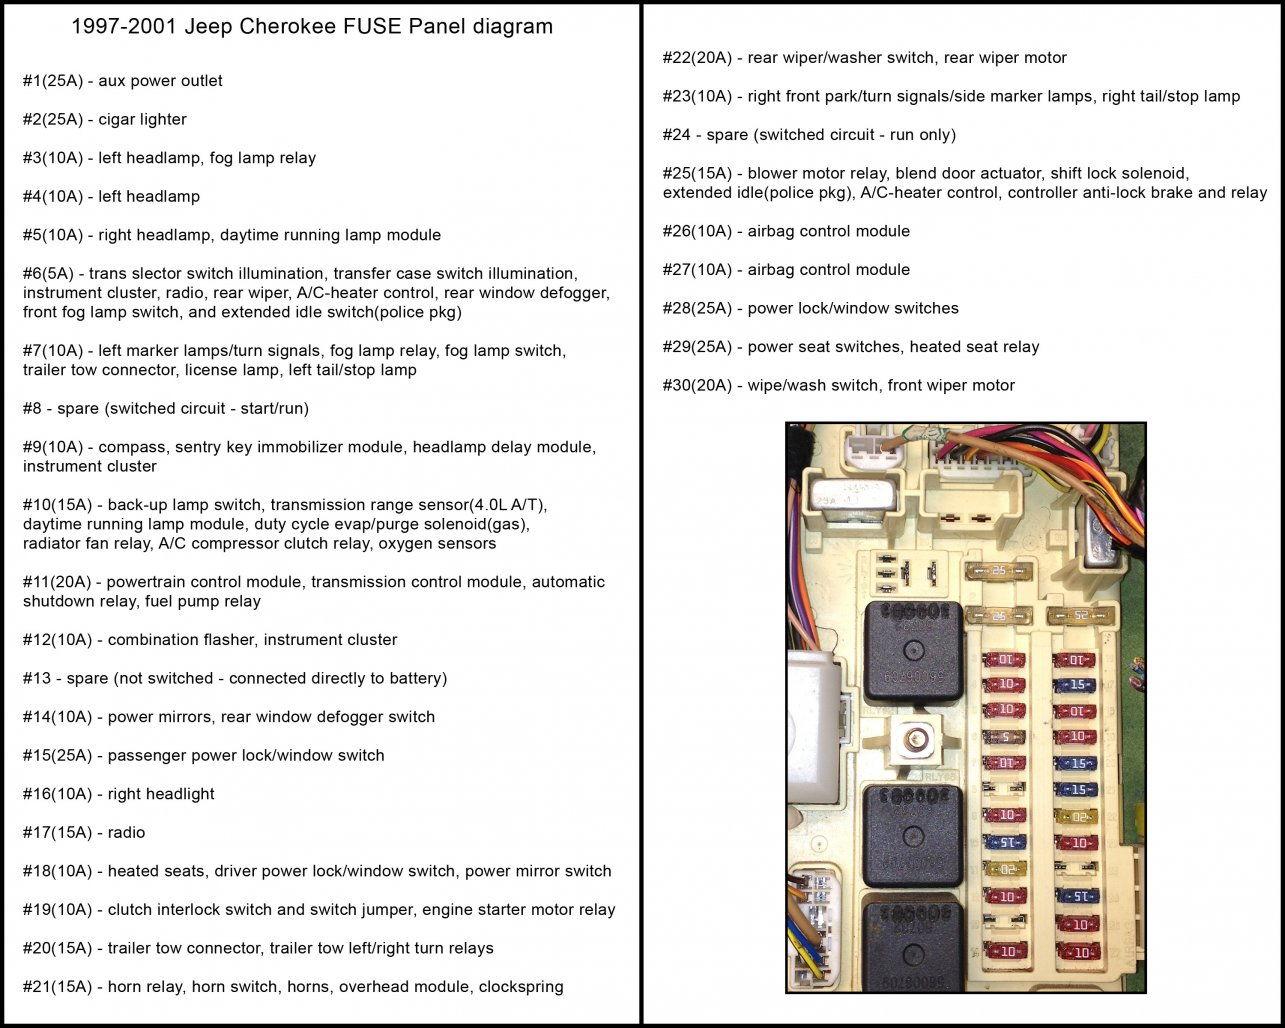 1997 Jeep Cherokee Relay Diagram - Wiring Diagram & Cable ... Jeep Cherokee Cruise Control Wiring Diagram on